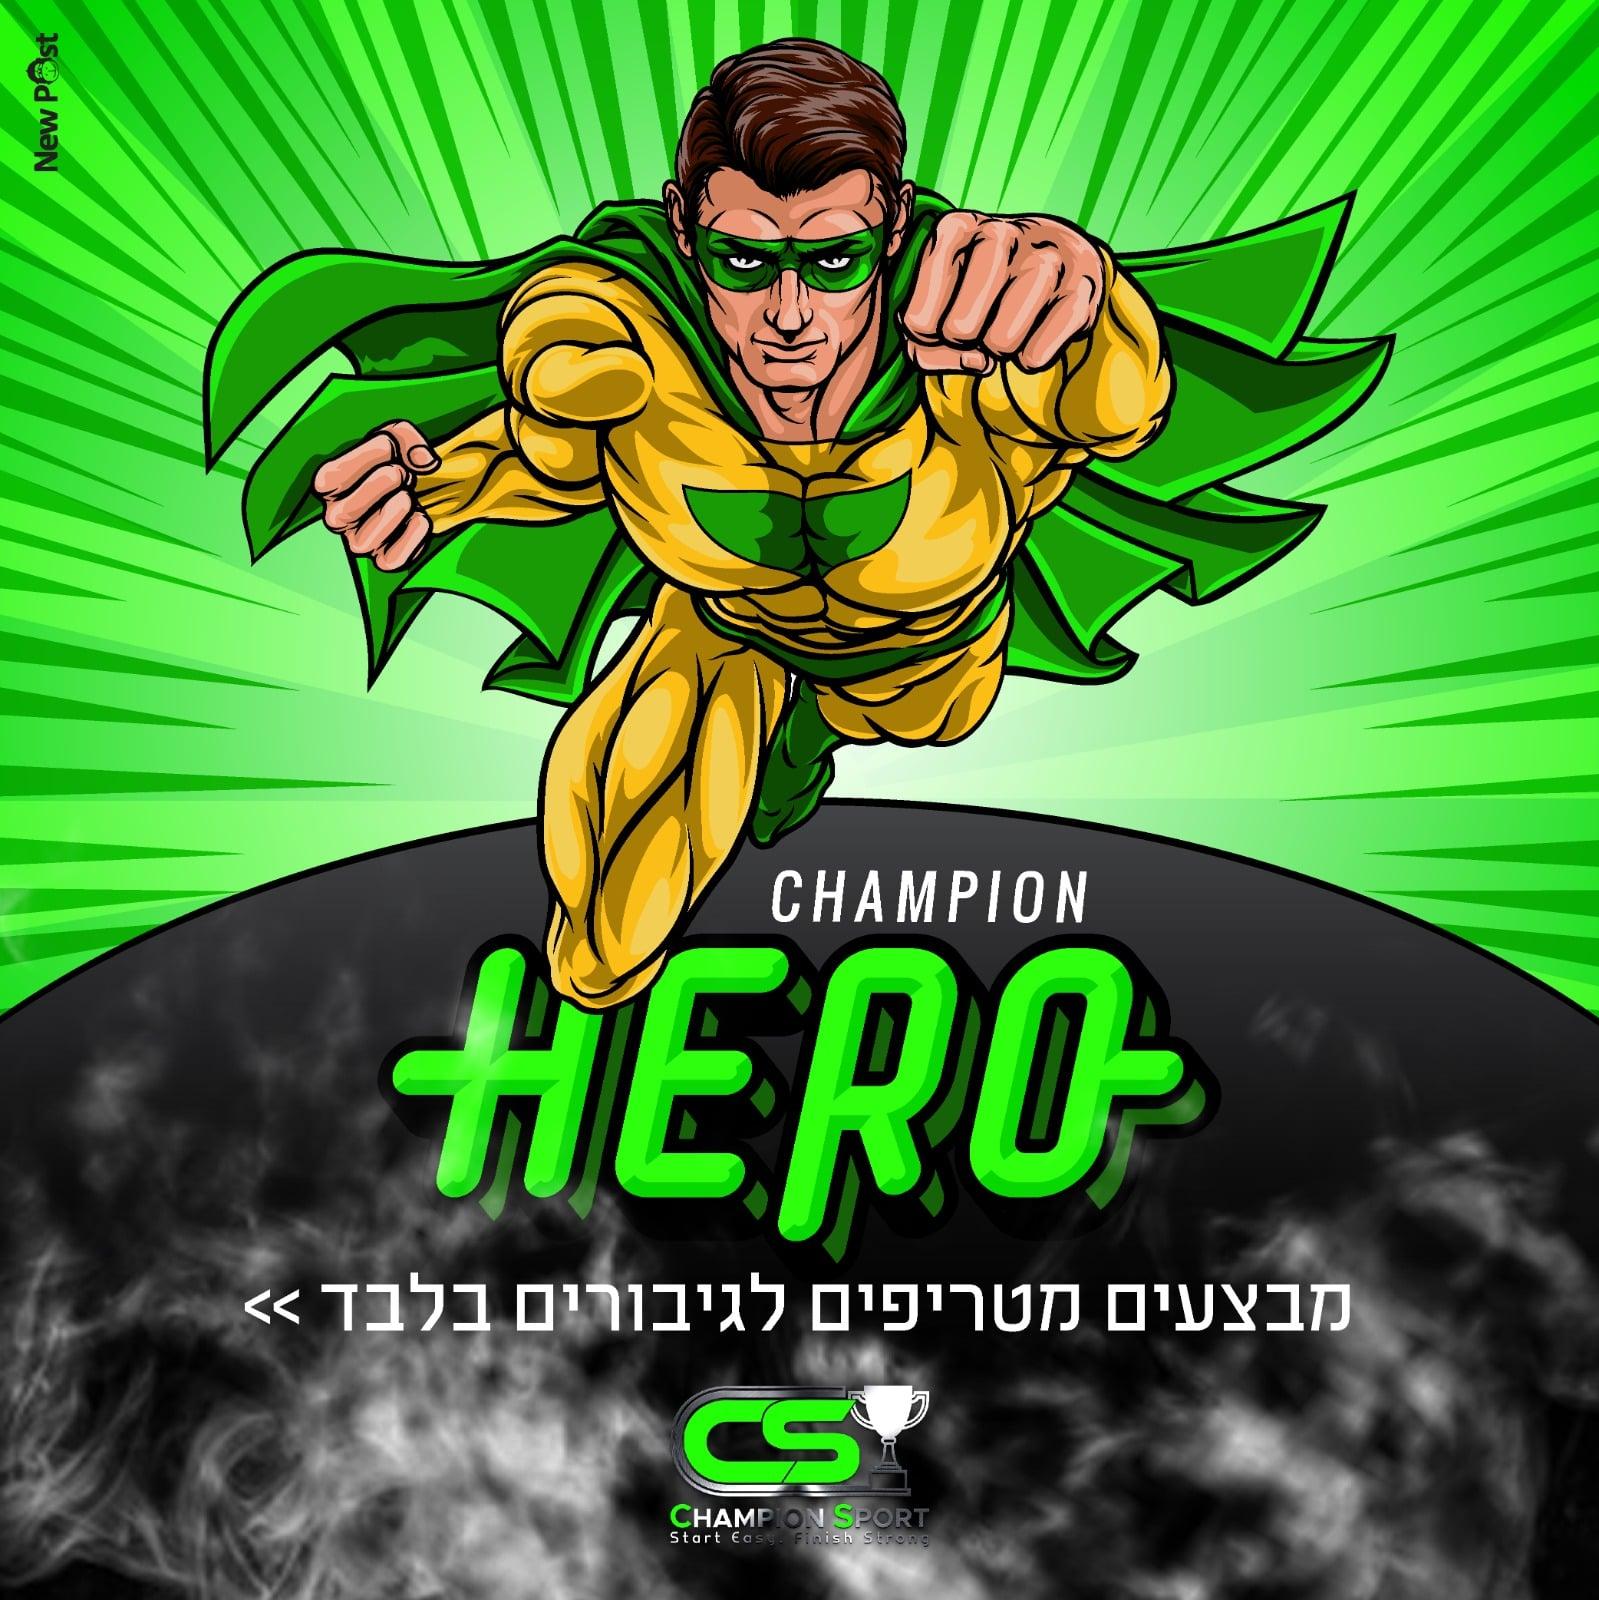 CHAMPION HERO|סדרת כוכבי העל - CHAMPION SPORT